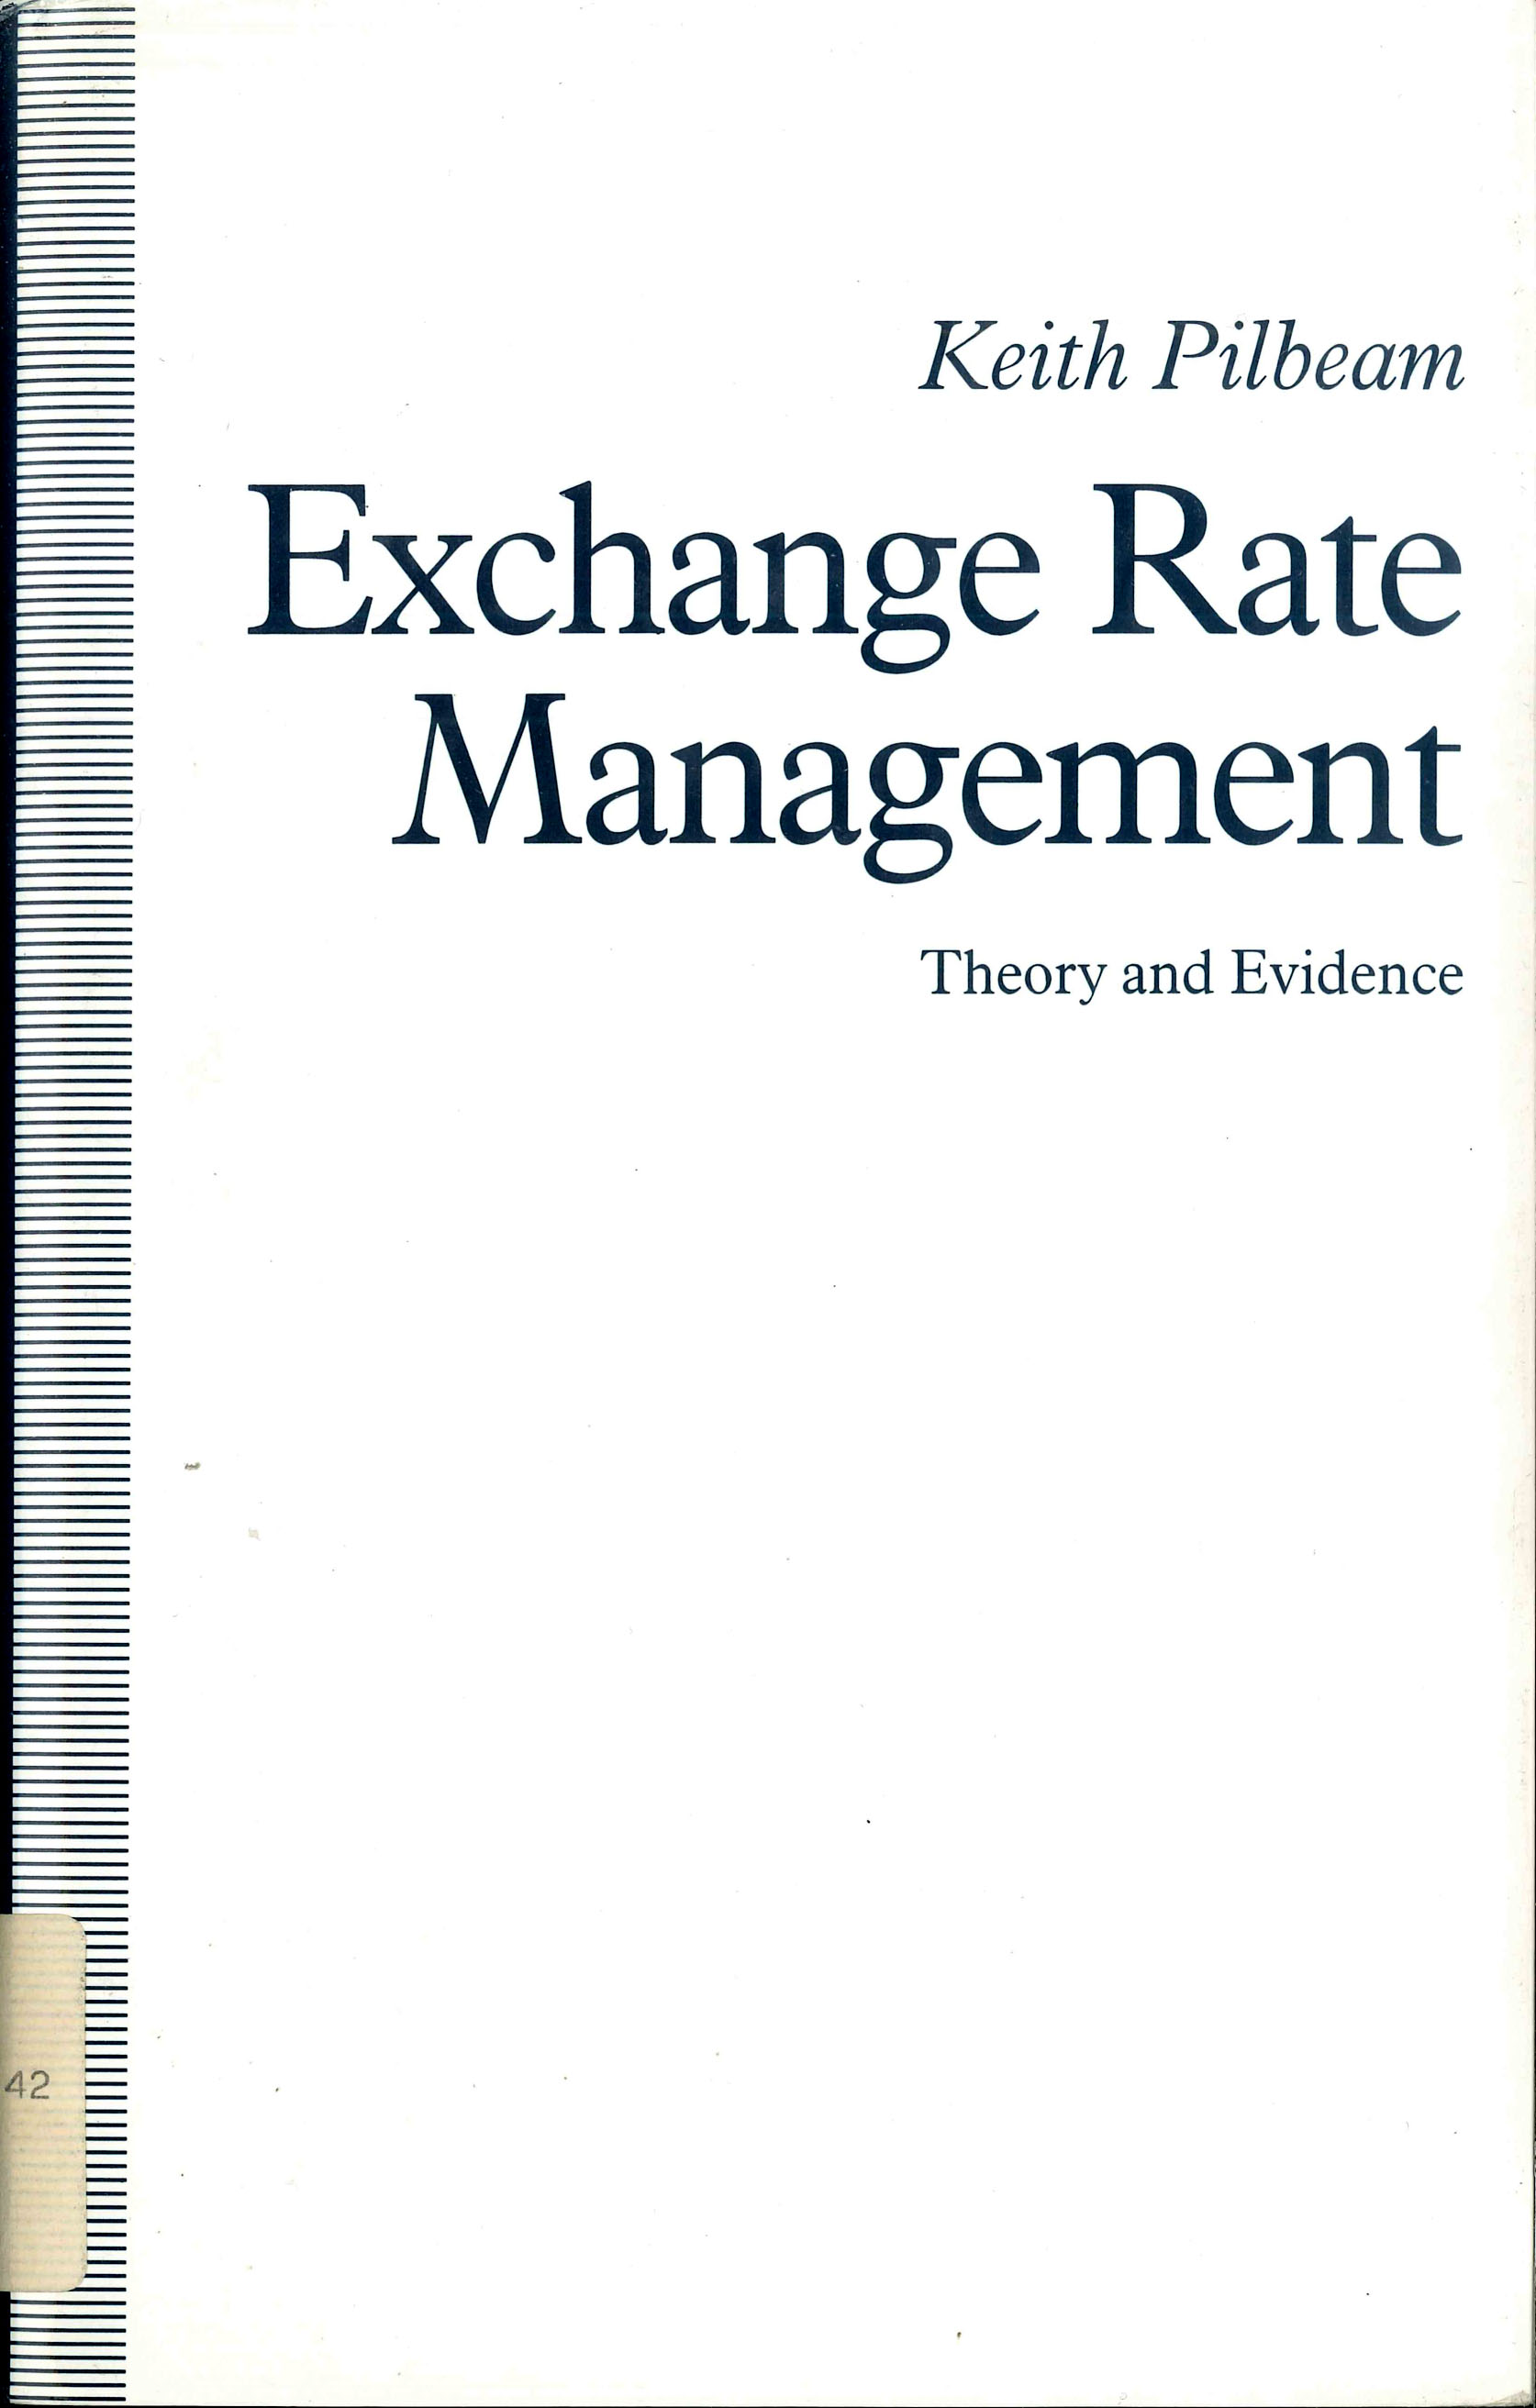 keith pilbeam international finance 4th edition pdf